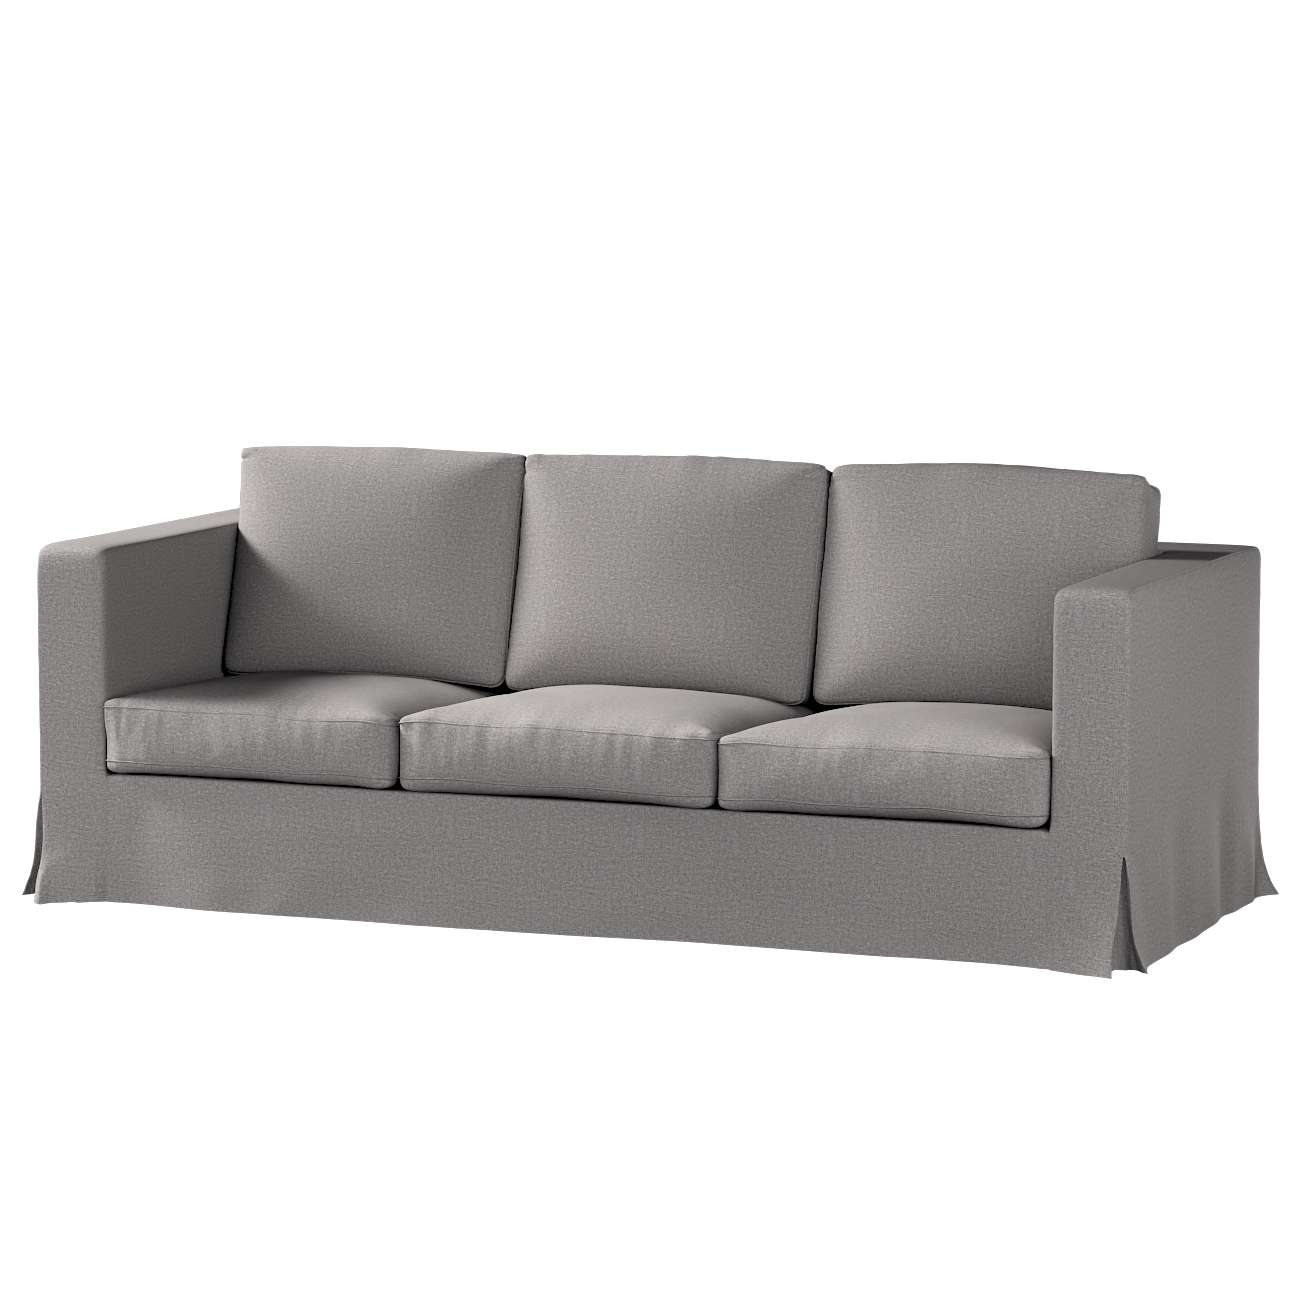 Karlanda klädsel 3-sits soffa - lång i kollektionen Edinburgh, Tyg: 115-81